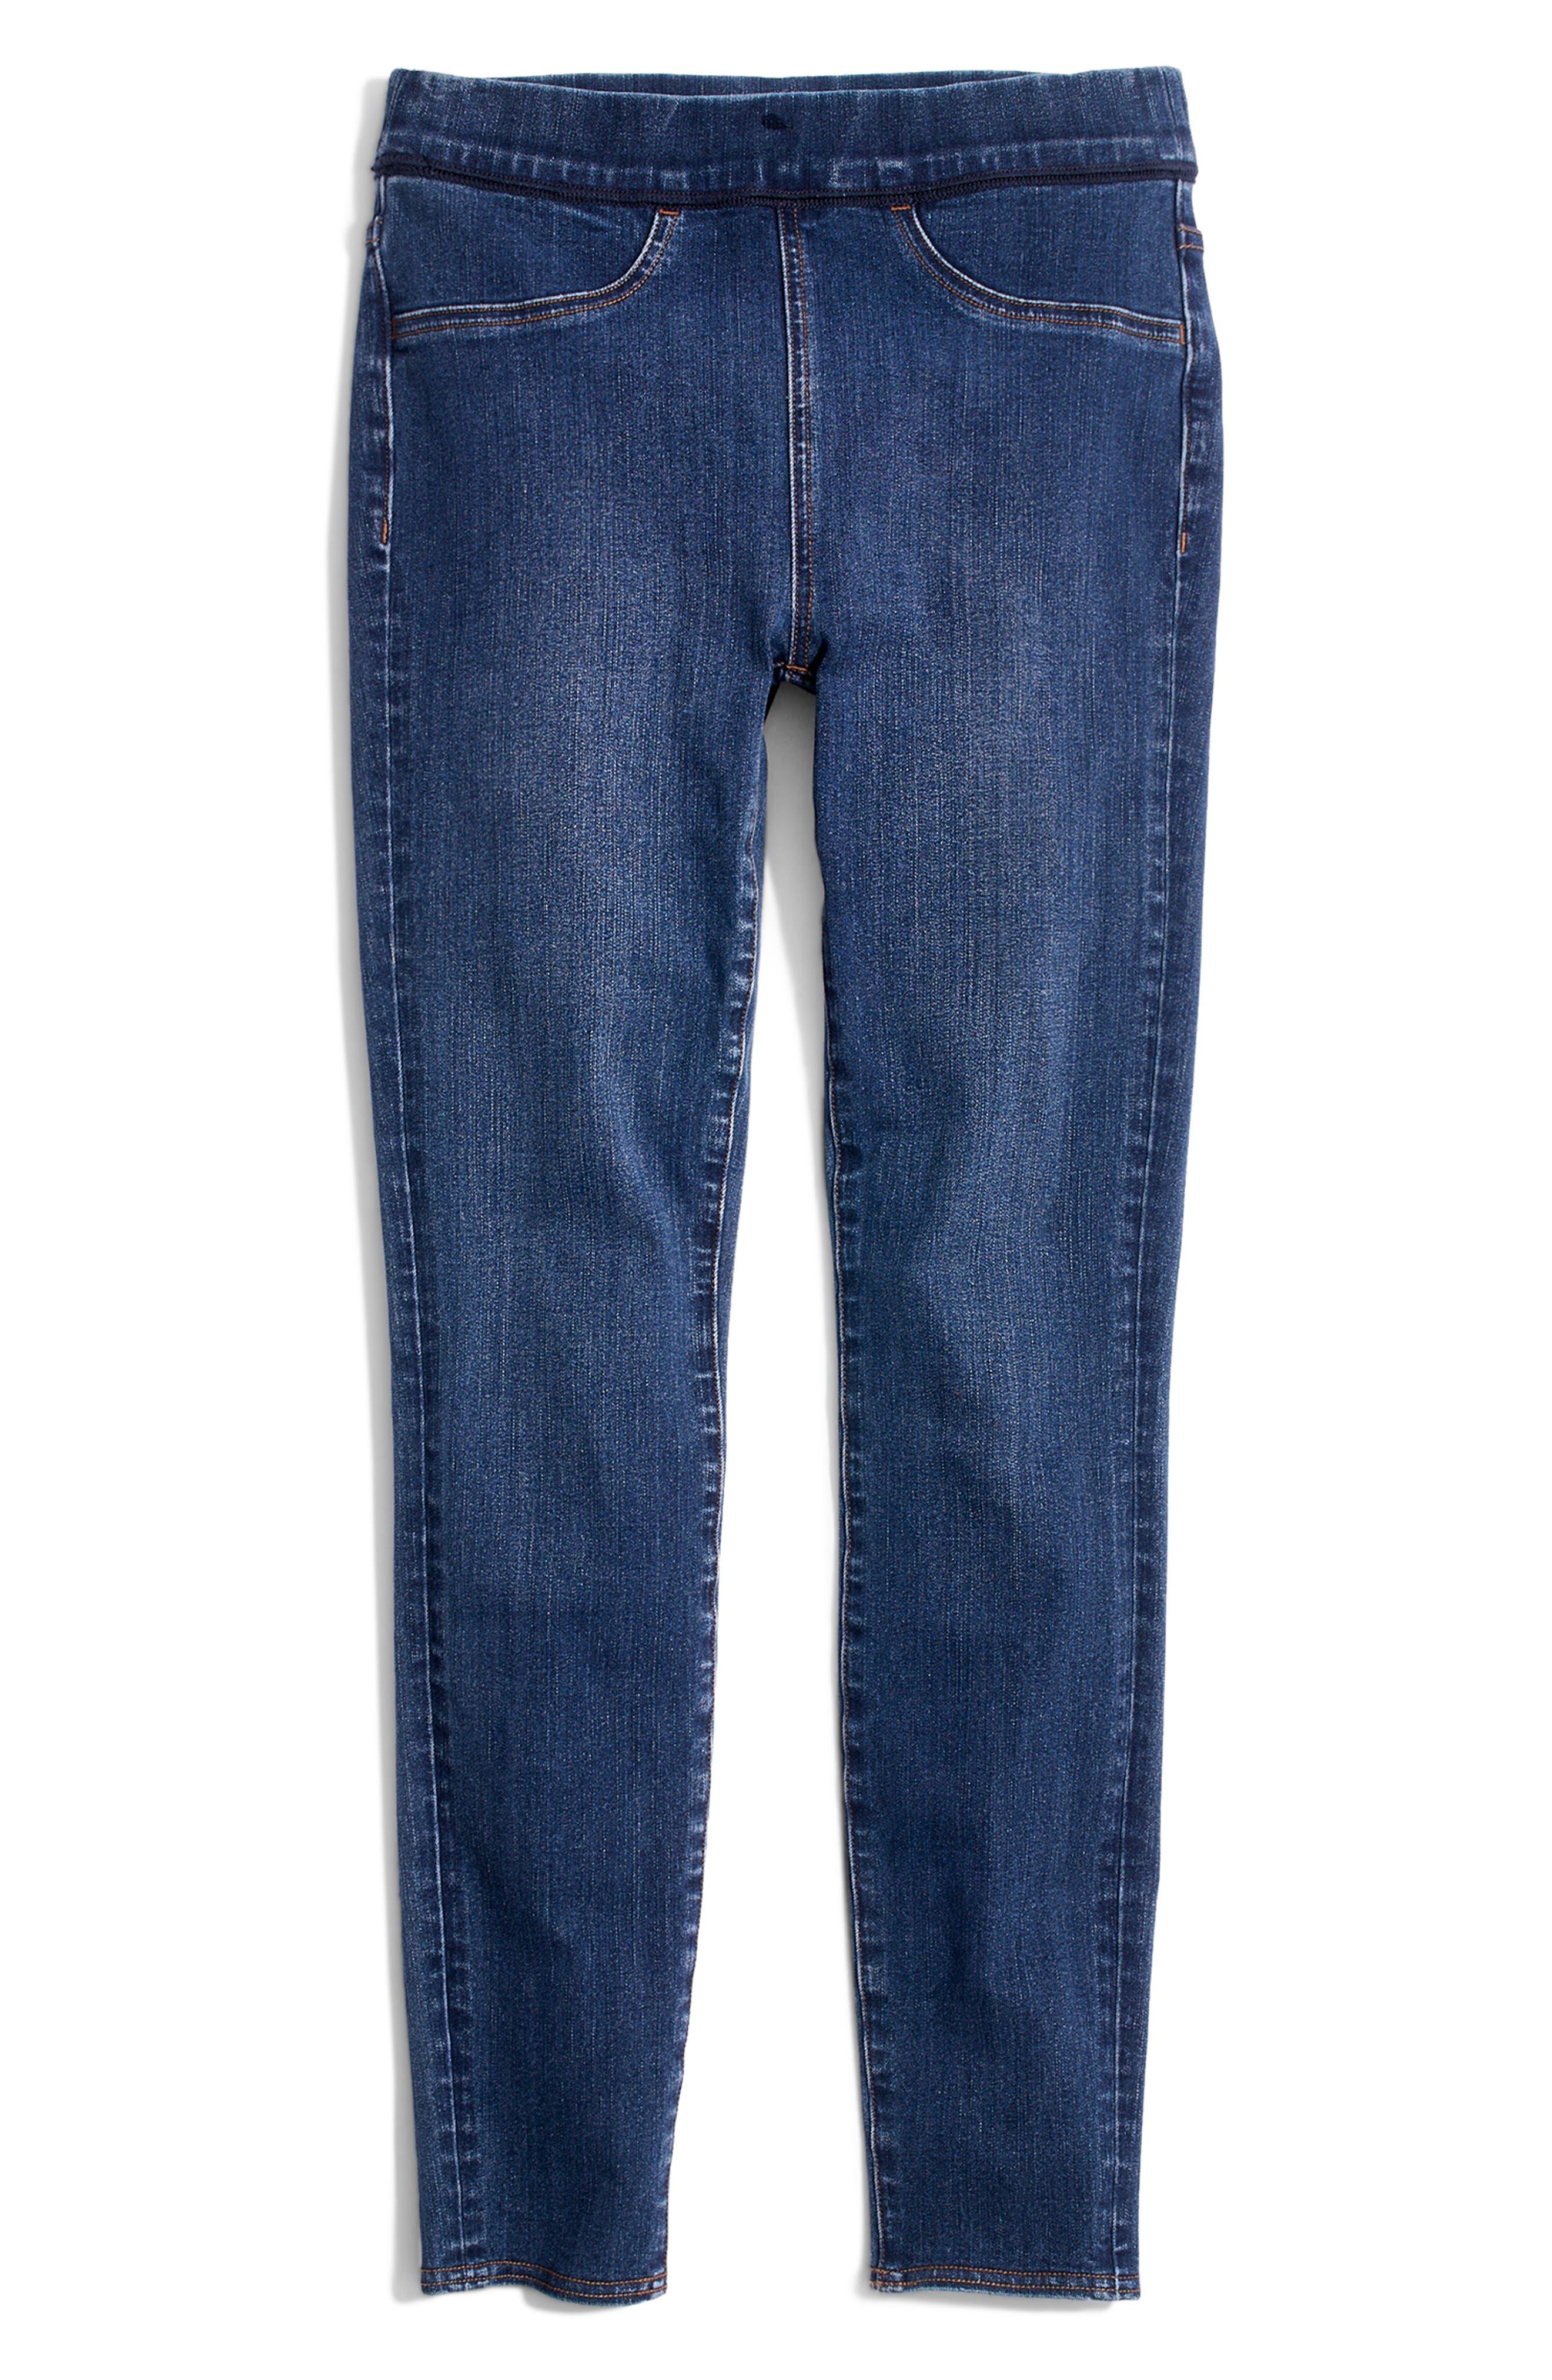 MADEWELL, Pull-On Jeans, Alternate thumbnail 6, color, FREEBURG